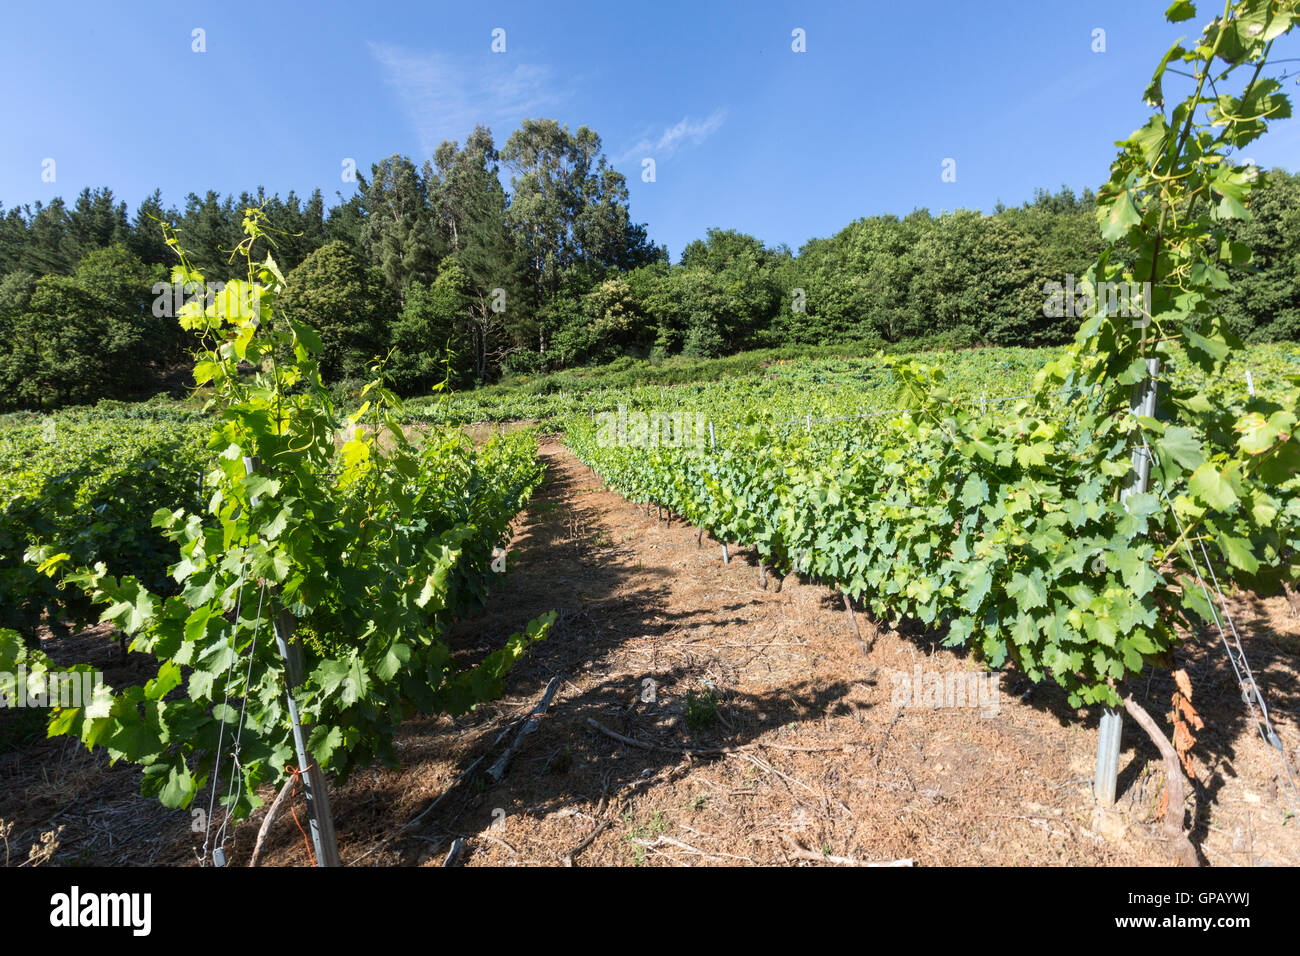 Grapes of Ribera Sacra DO in Miño river Paradela, Lugo Province, Galicia, Spain - Stock Image